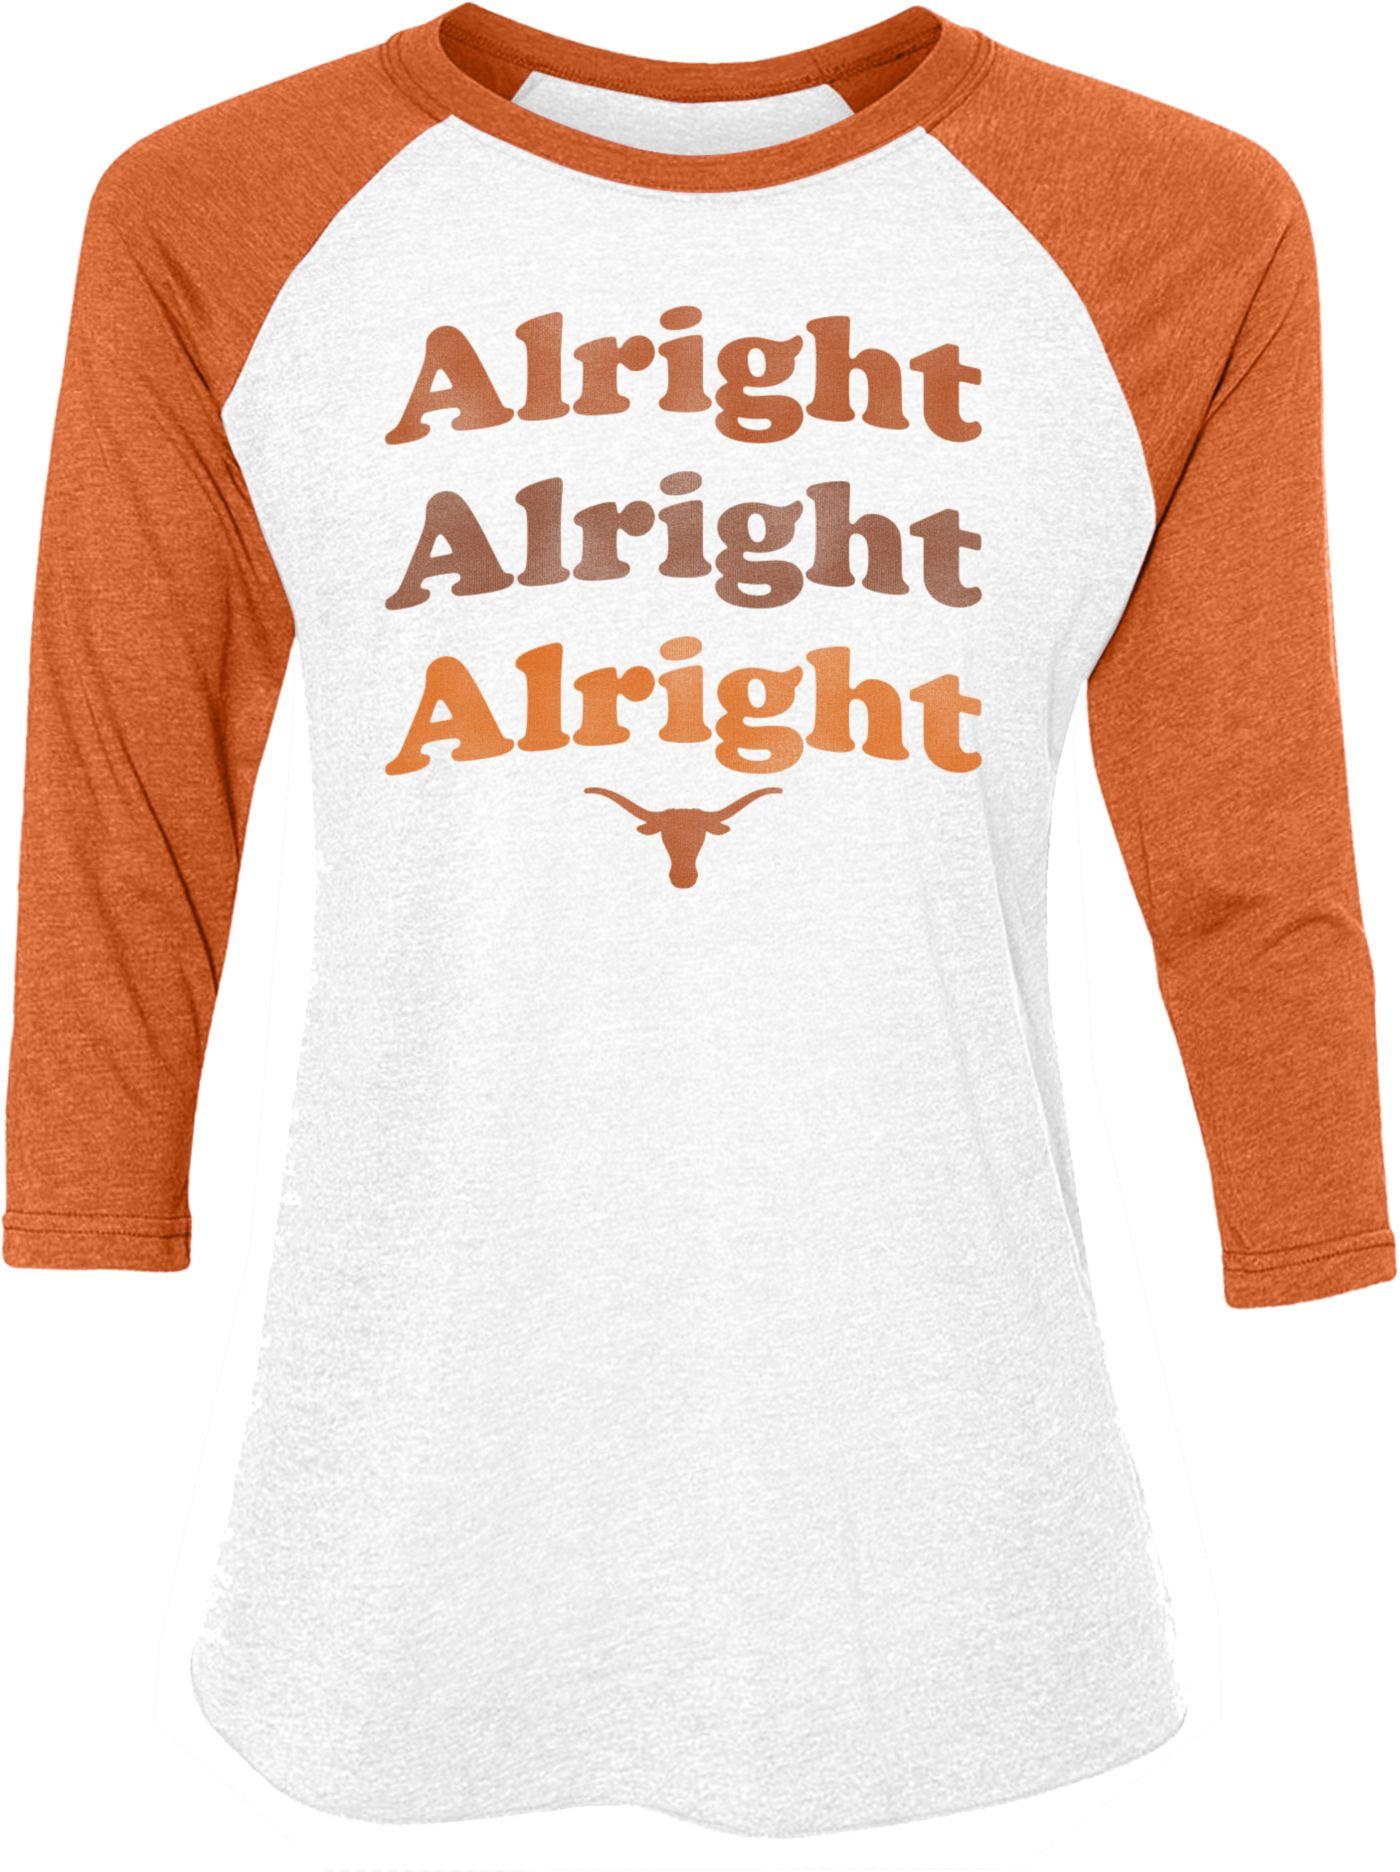 University of Texas Authentic Apparel Women's Texas Longhorns Burnt Orange 'Alright Alright Alright' Raglan T-Shirt